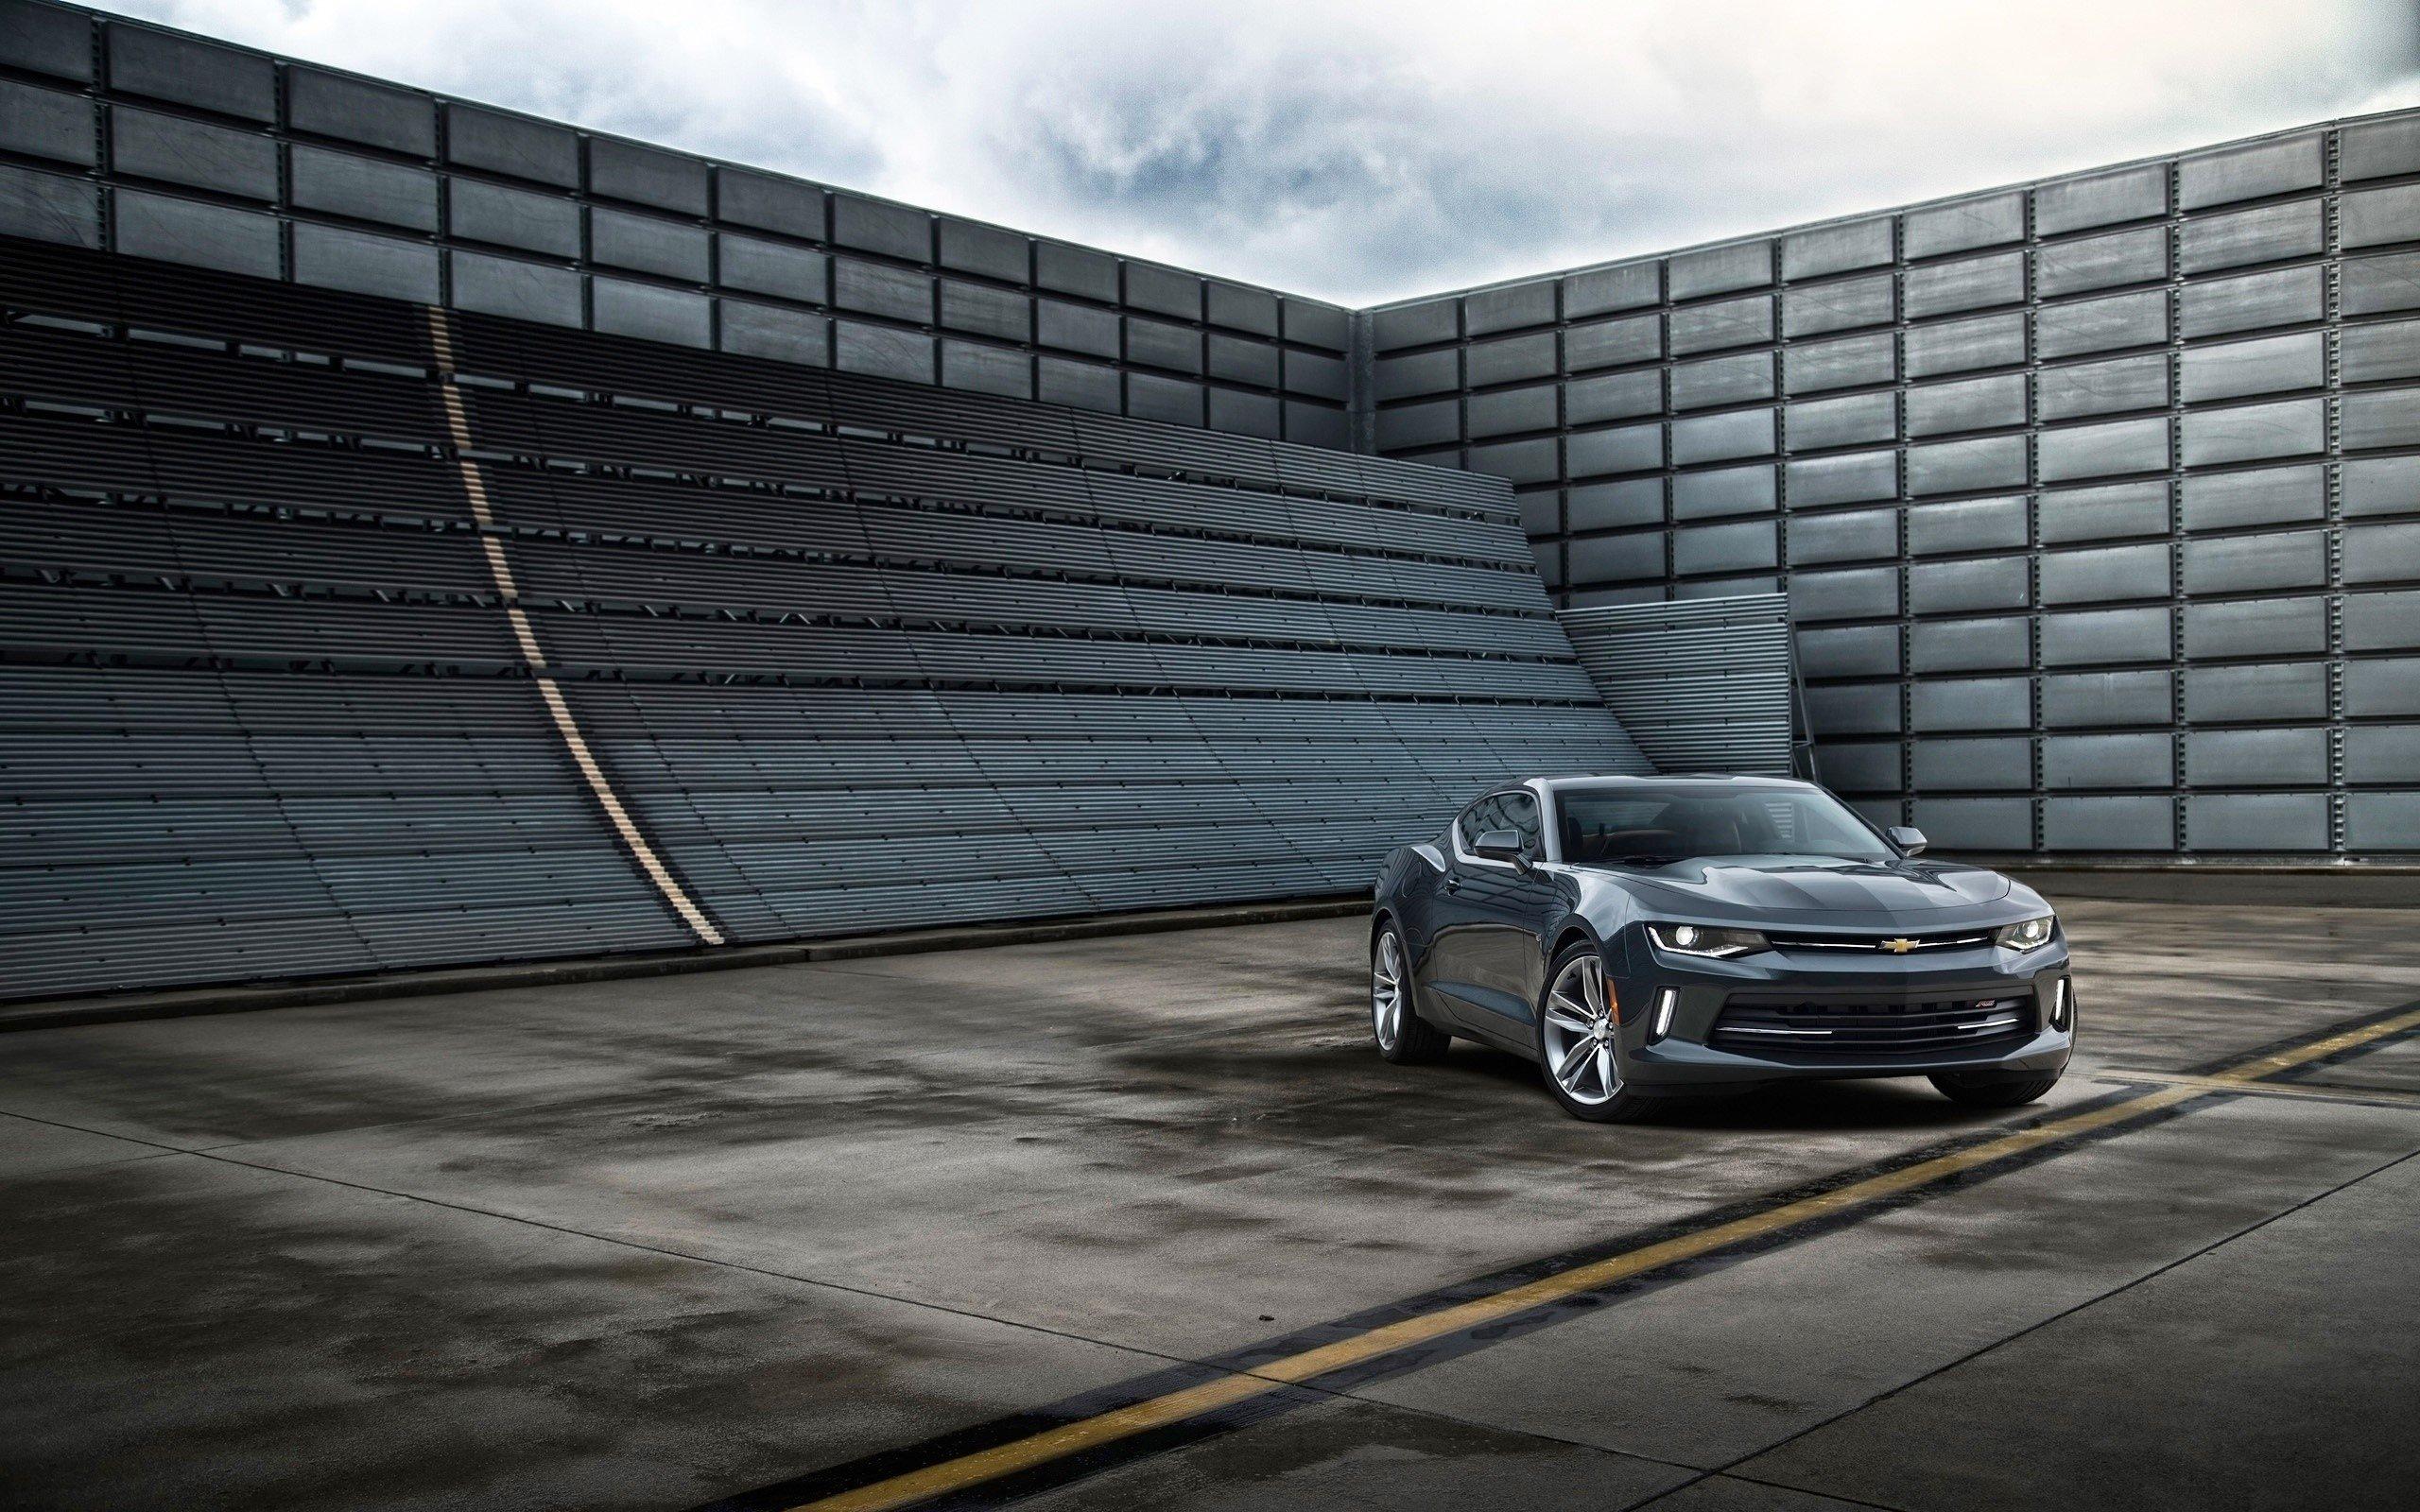 Wallpaper Chevrolet Camaro RS